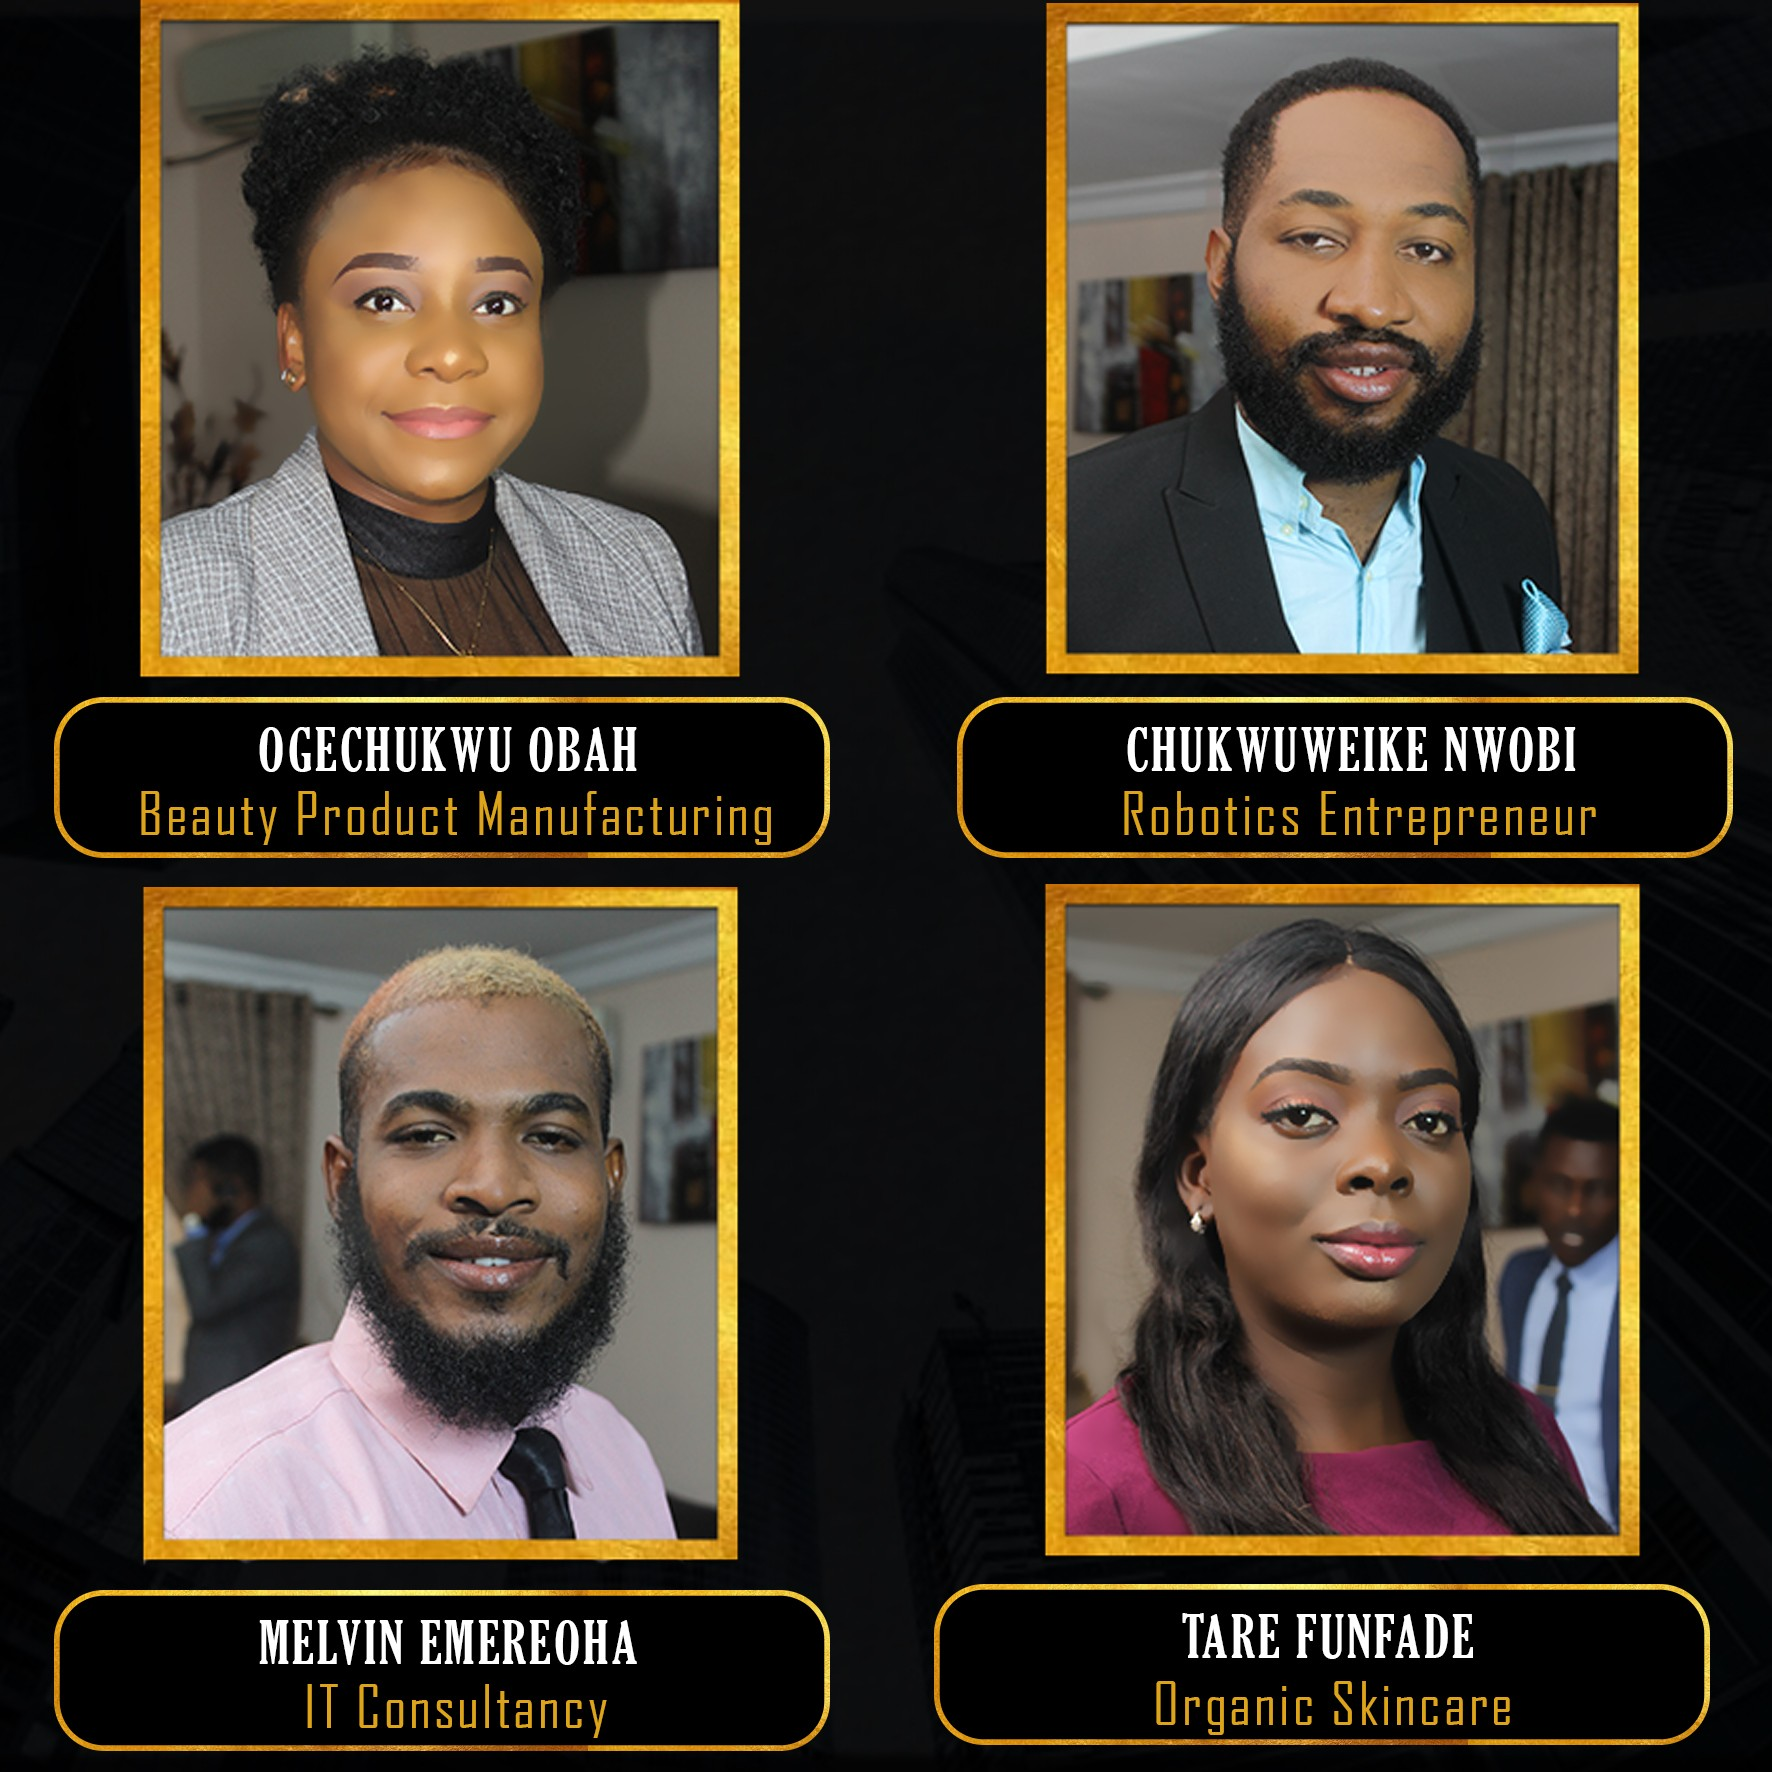 Meet Top 10 Entrepreneurs of The Next Titan Nigeria 5.0